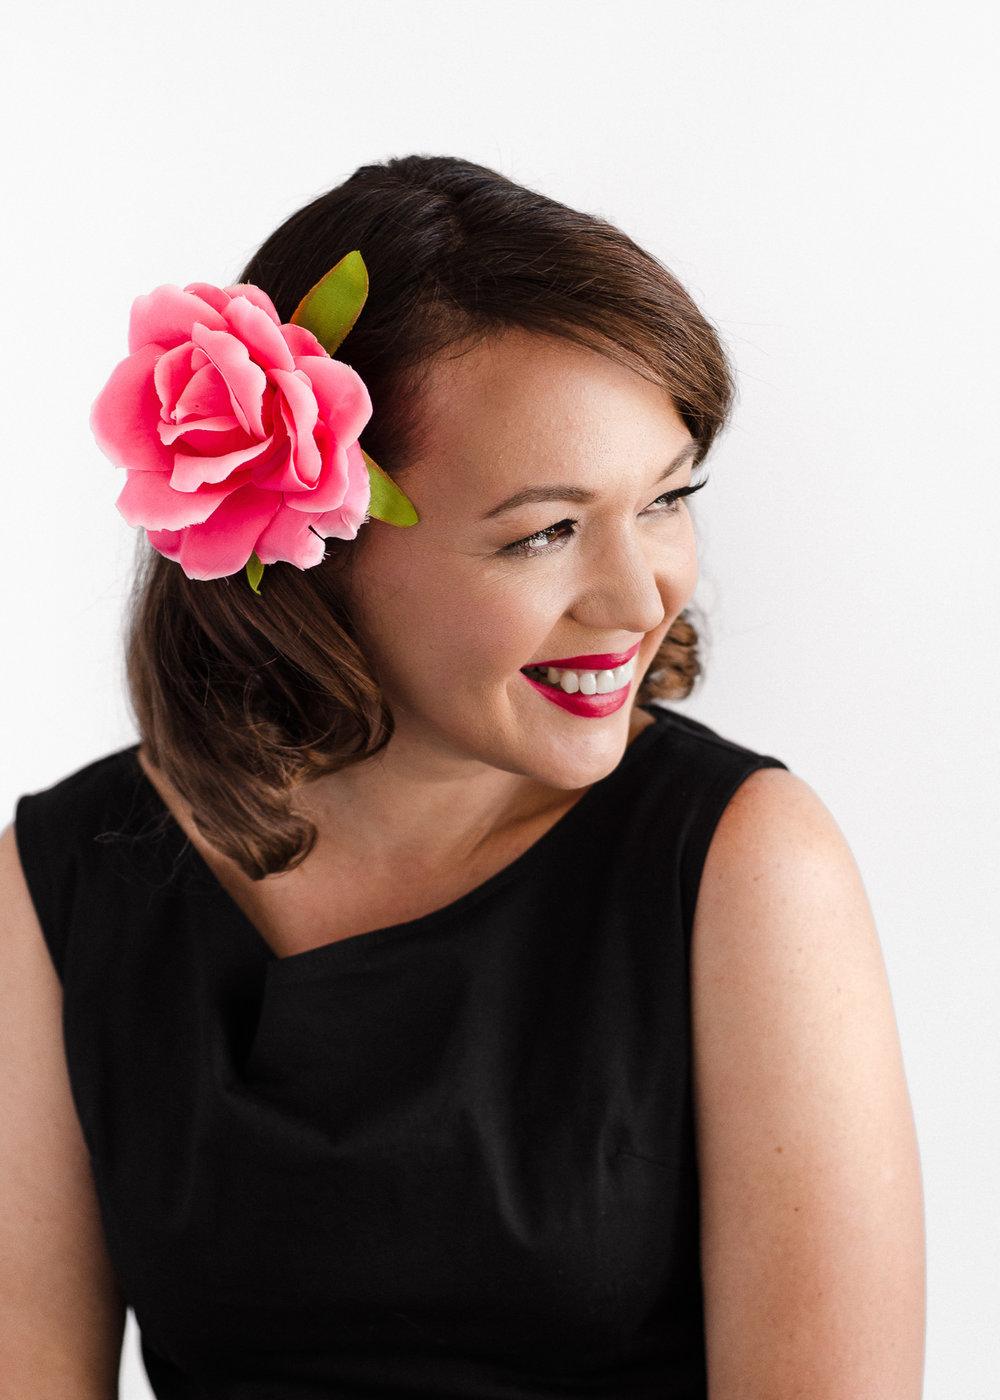 Portland Headshot Photographer Personal Branding Portrait Miranda Kelton Photography